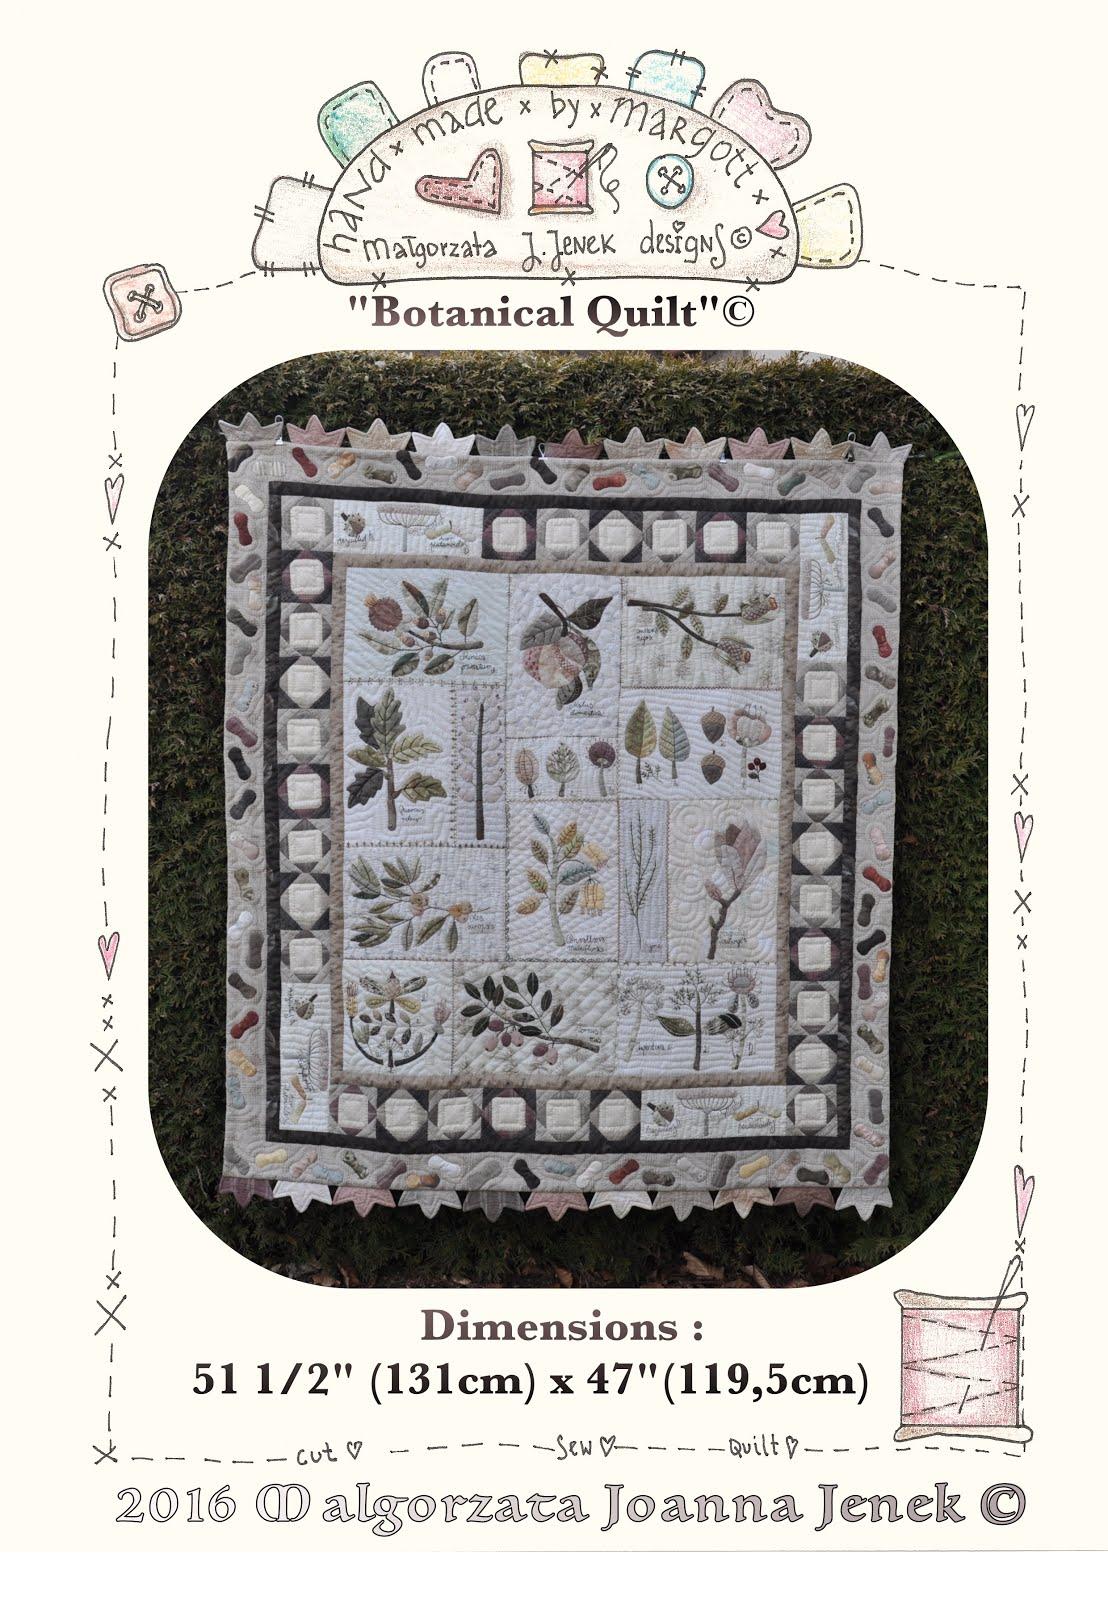 Botanical Quilt©